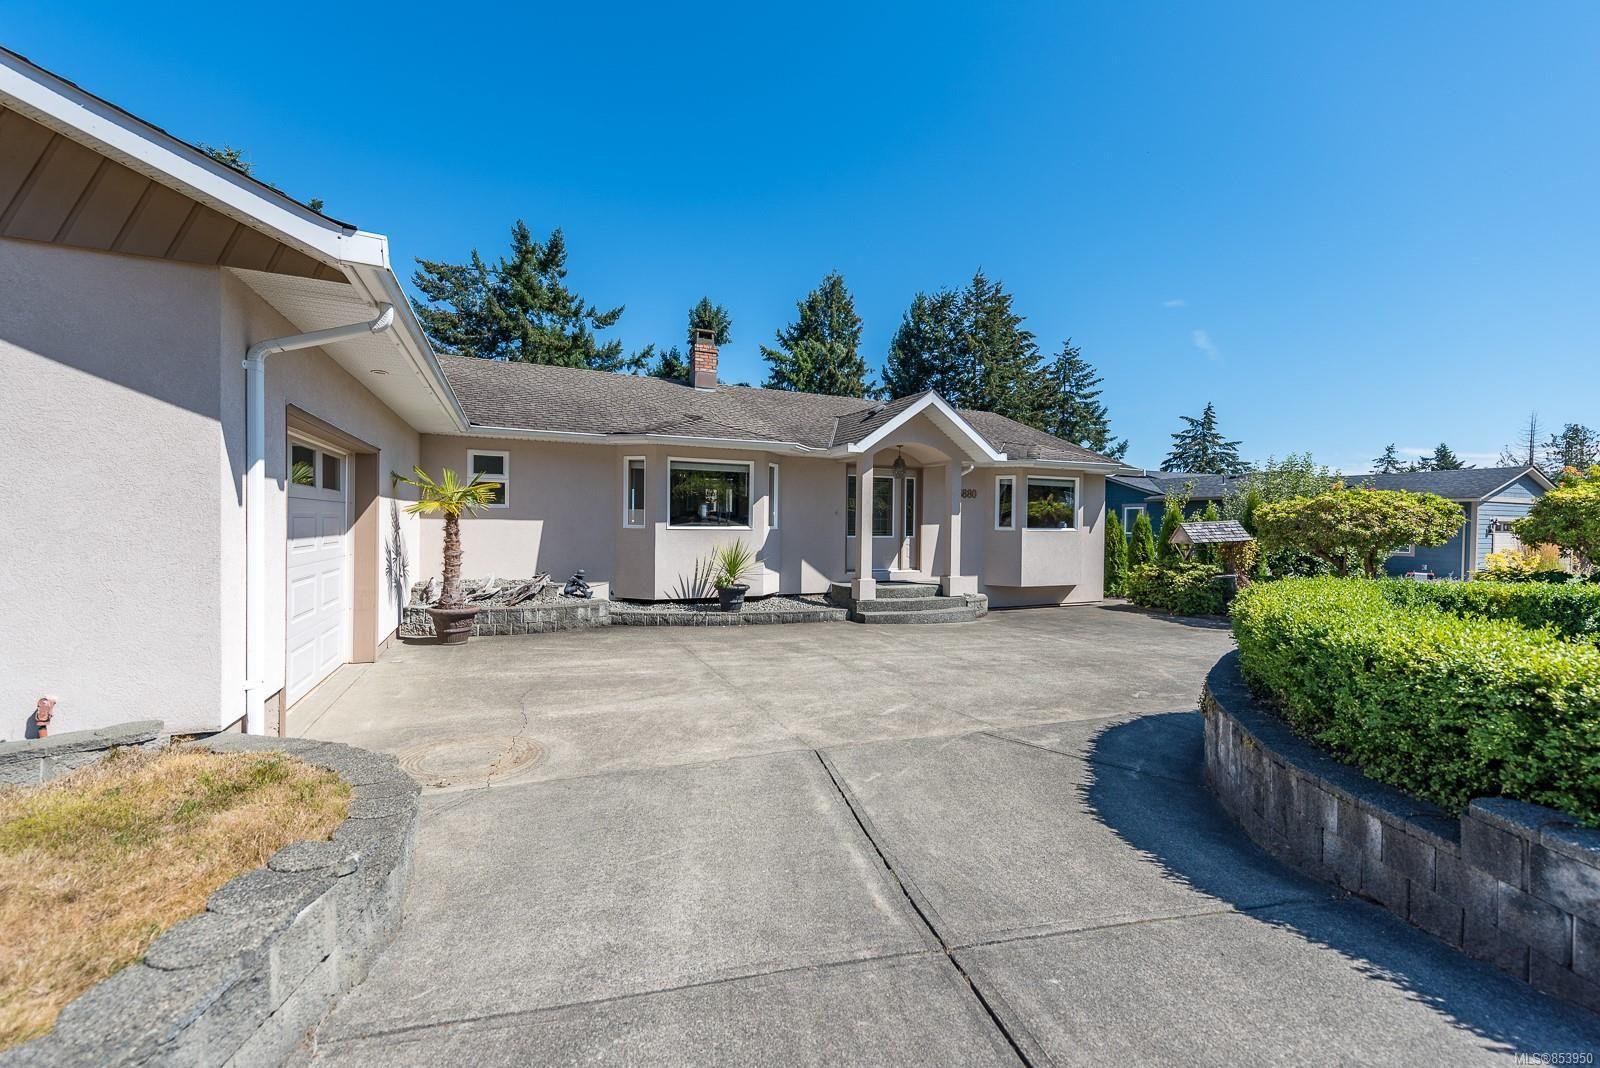 Photo 44: Photos: 5880 GARVIN Rd in : CV Union Bay/Fanny Bay House for sale (Comox Valley)  : MLS®# 853950